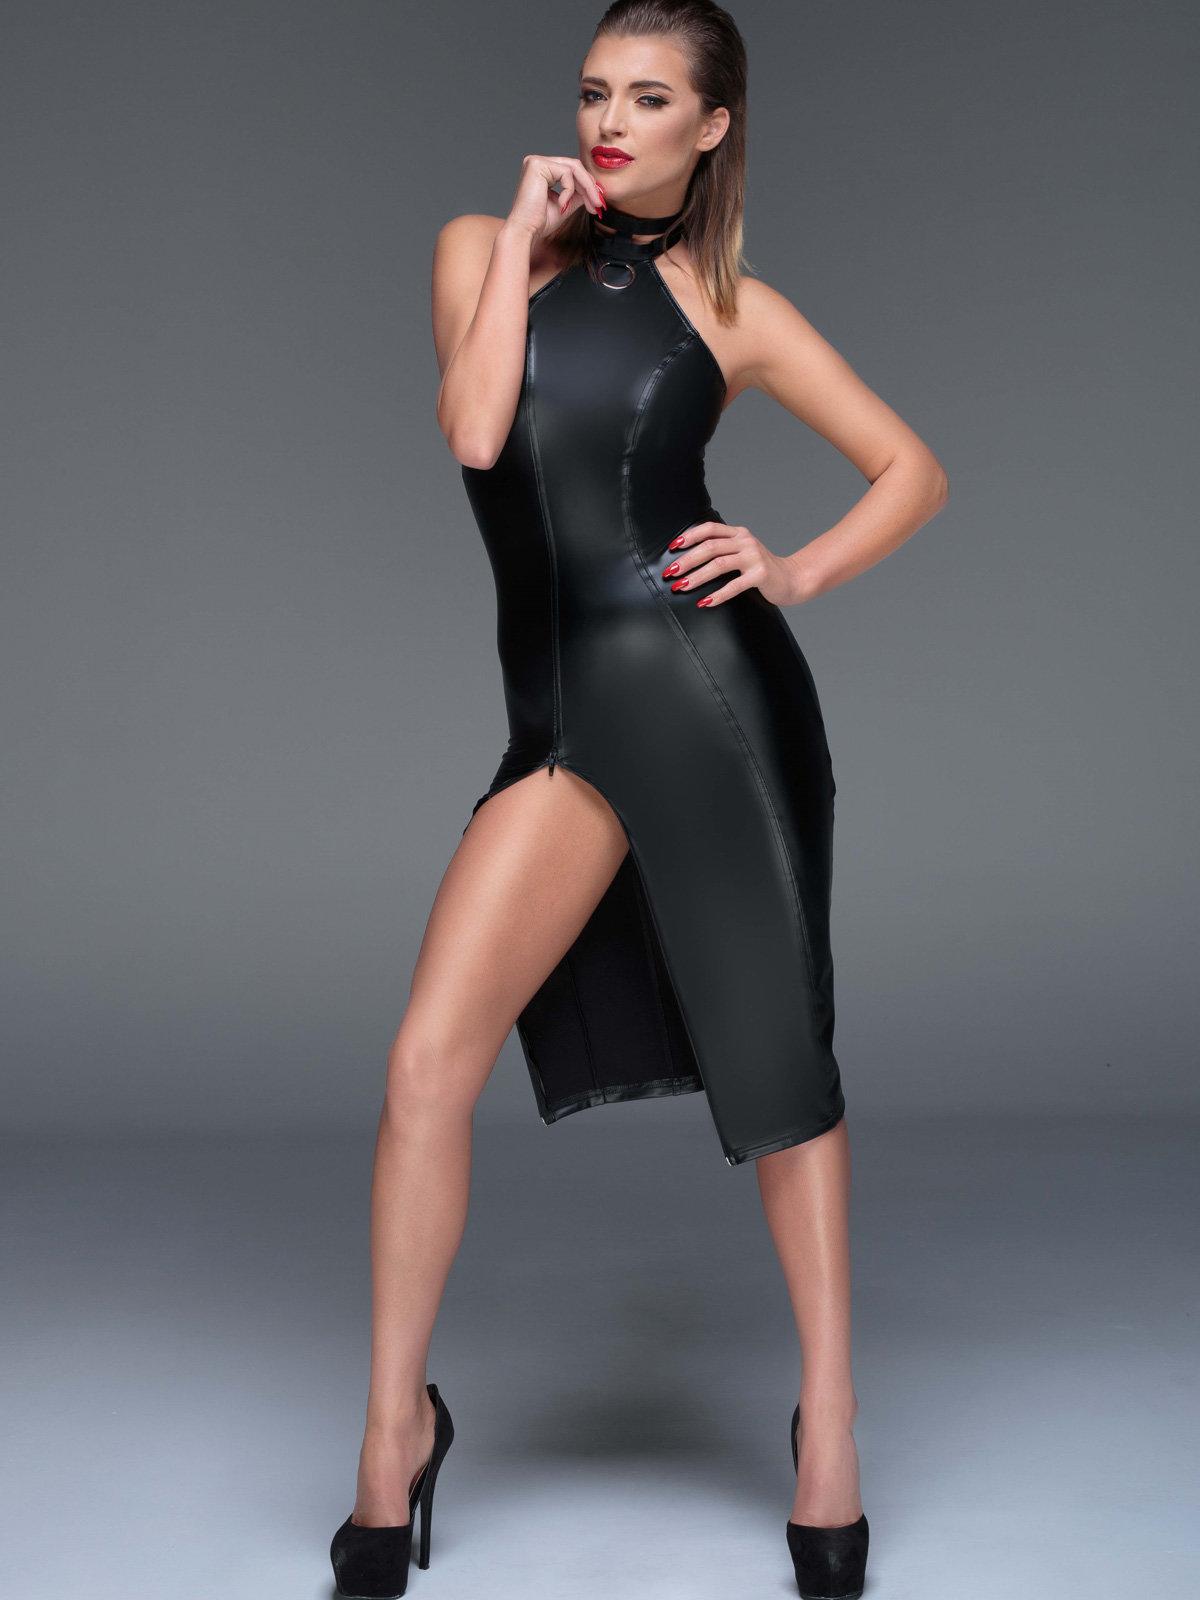 Chemise Powerwetlook pencil dress Negru de la Noir Handmade